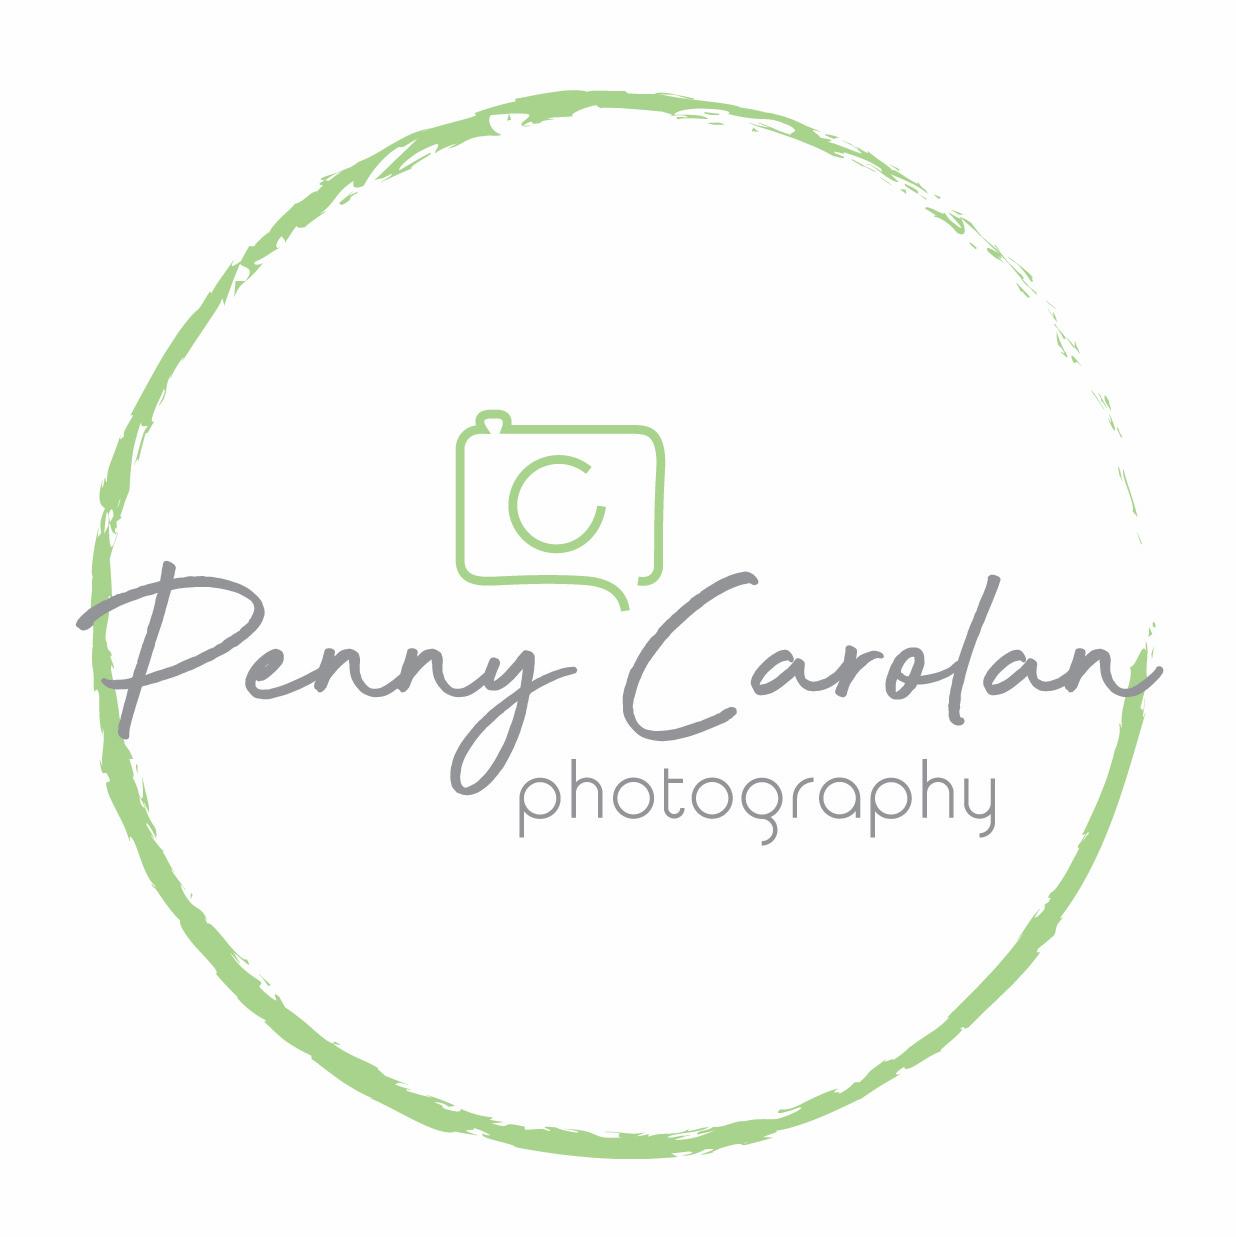 Penny Carolan Photography